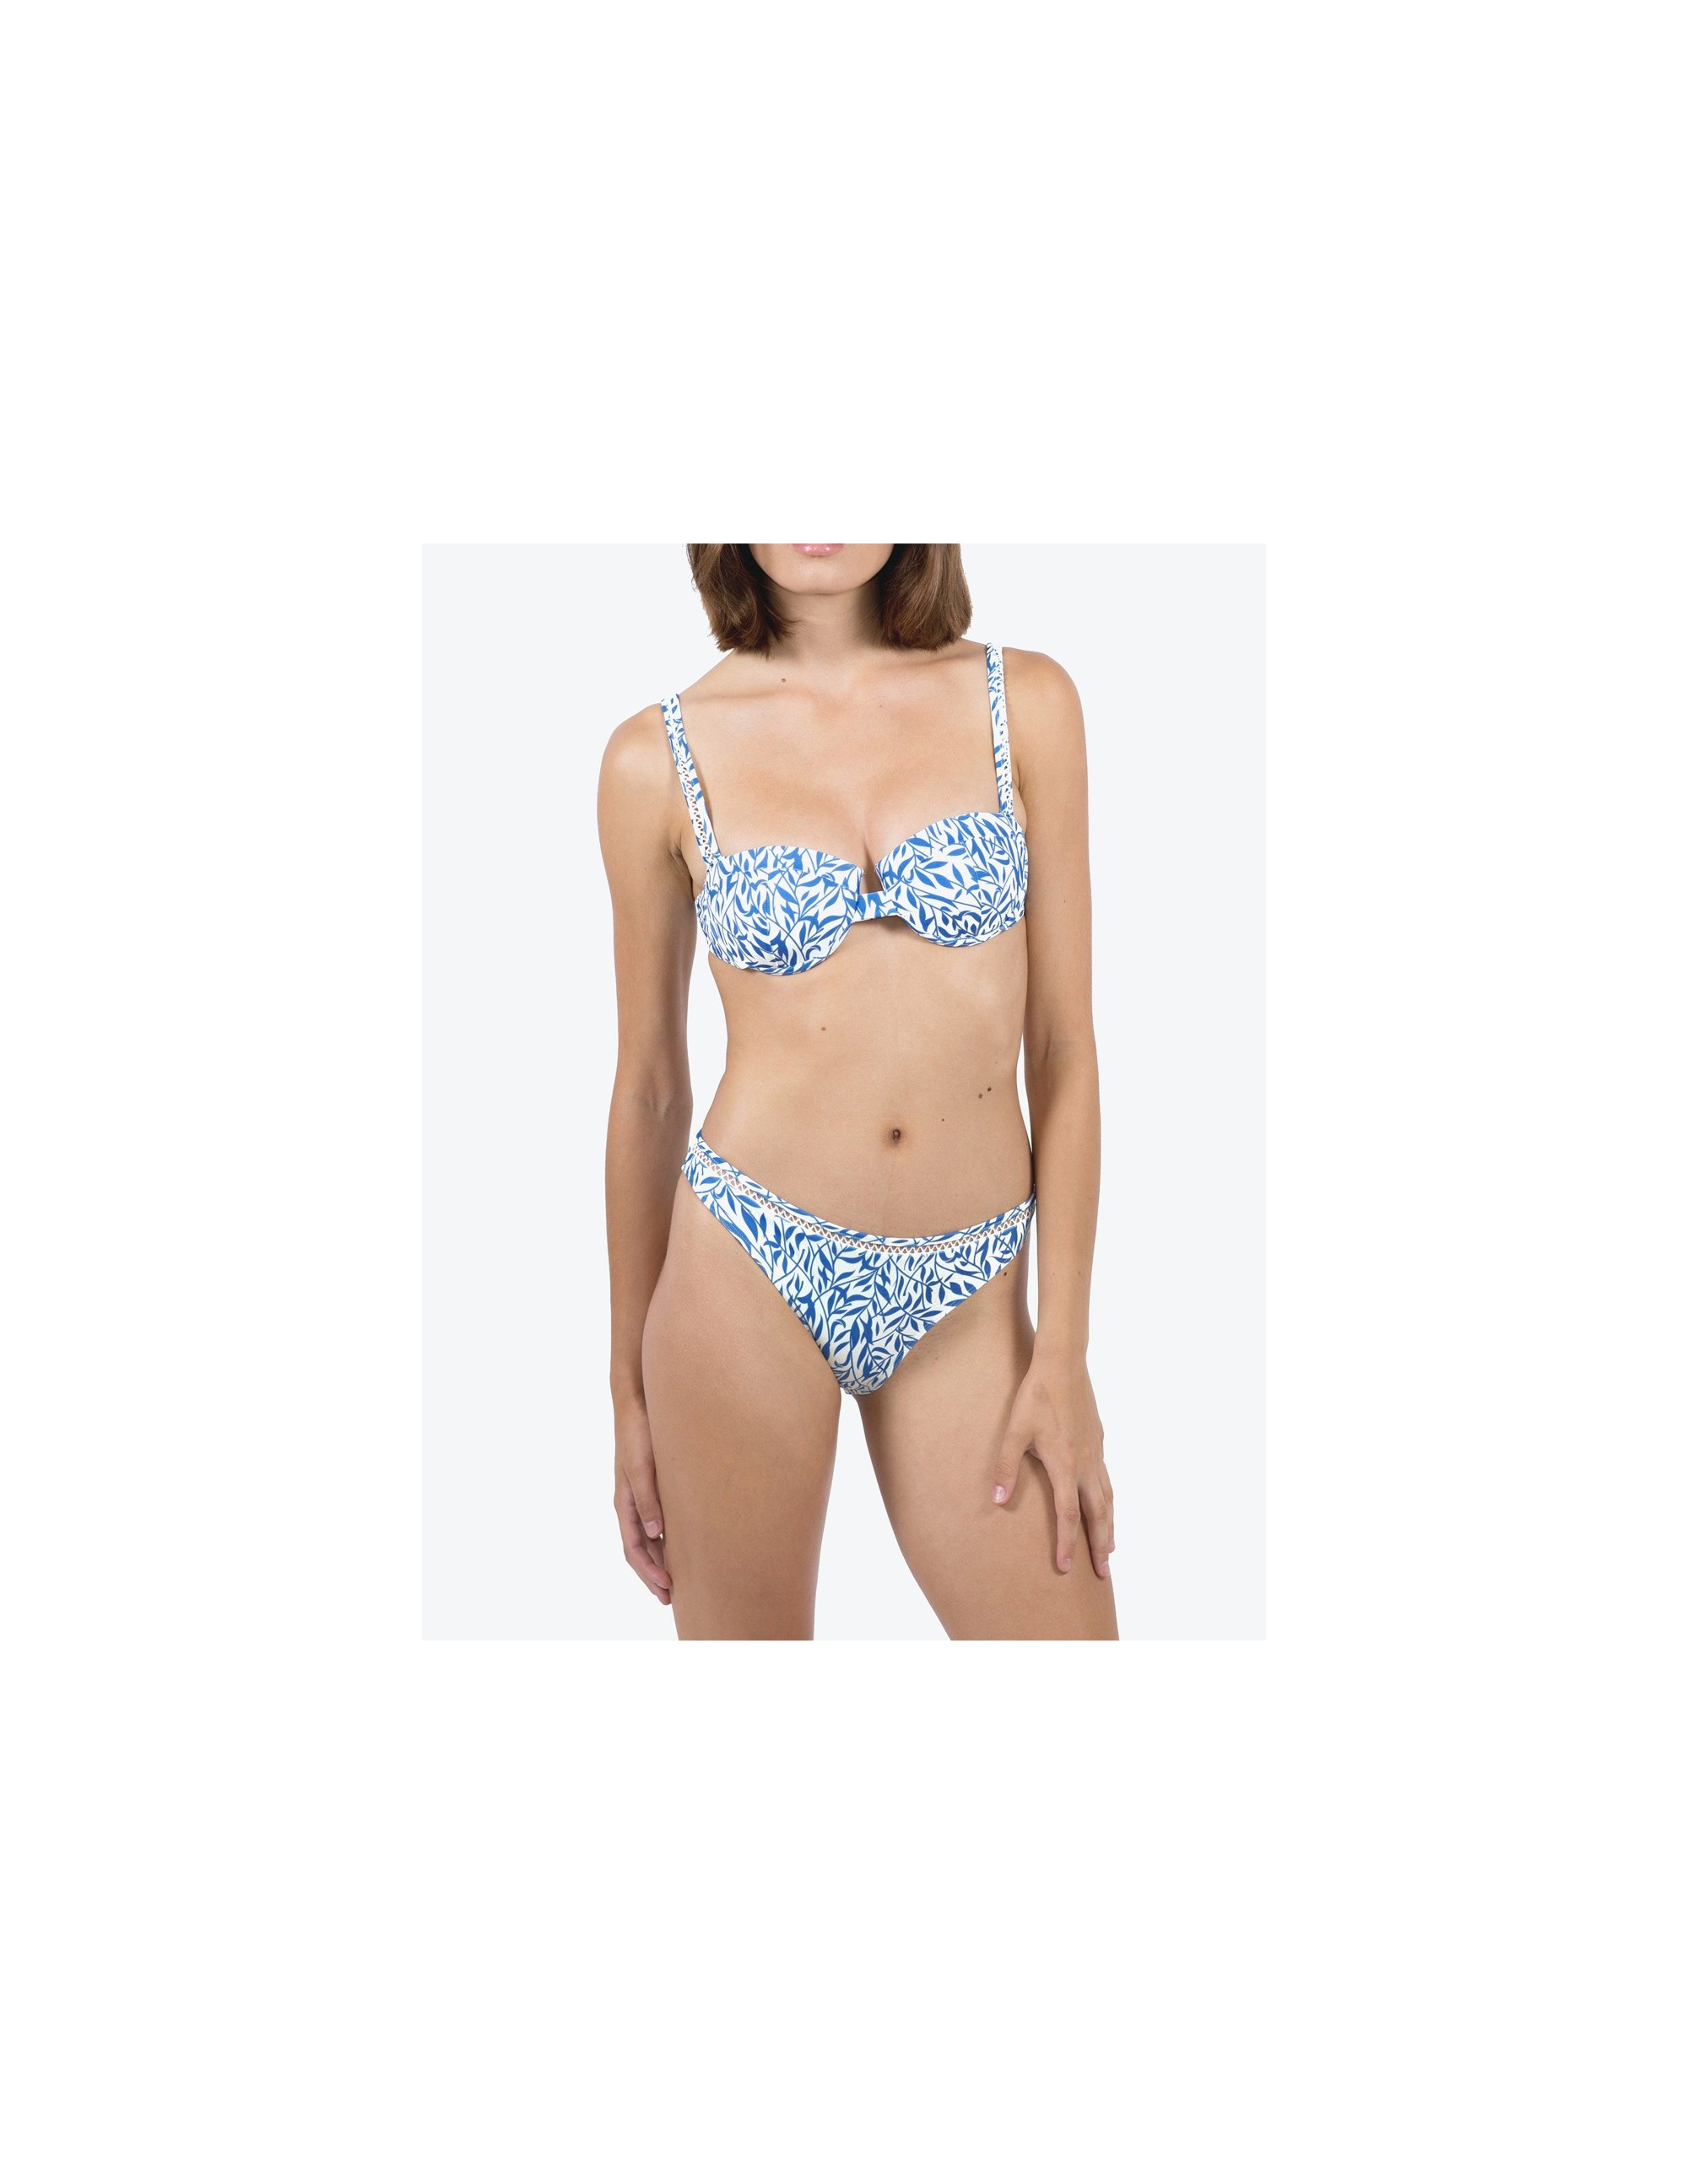 SIMOS bikini top - FLORAL BLUE